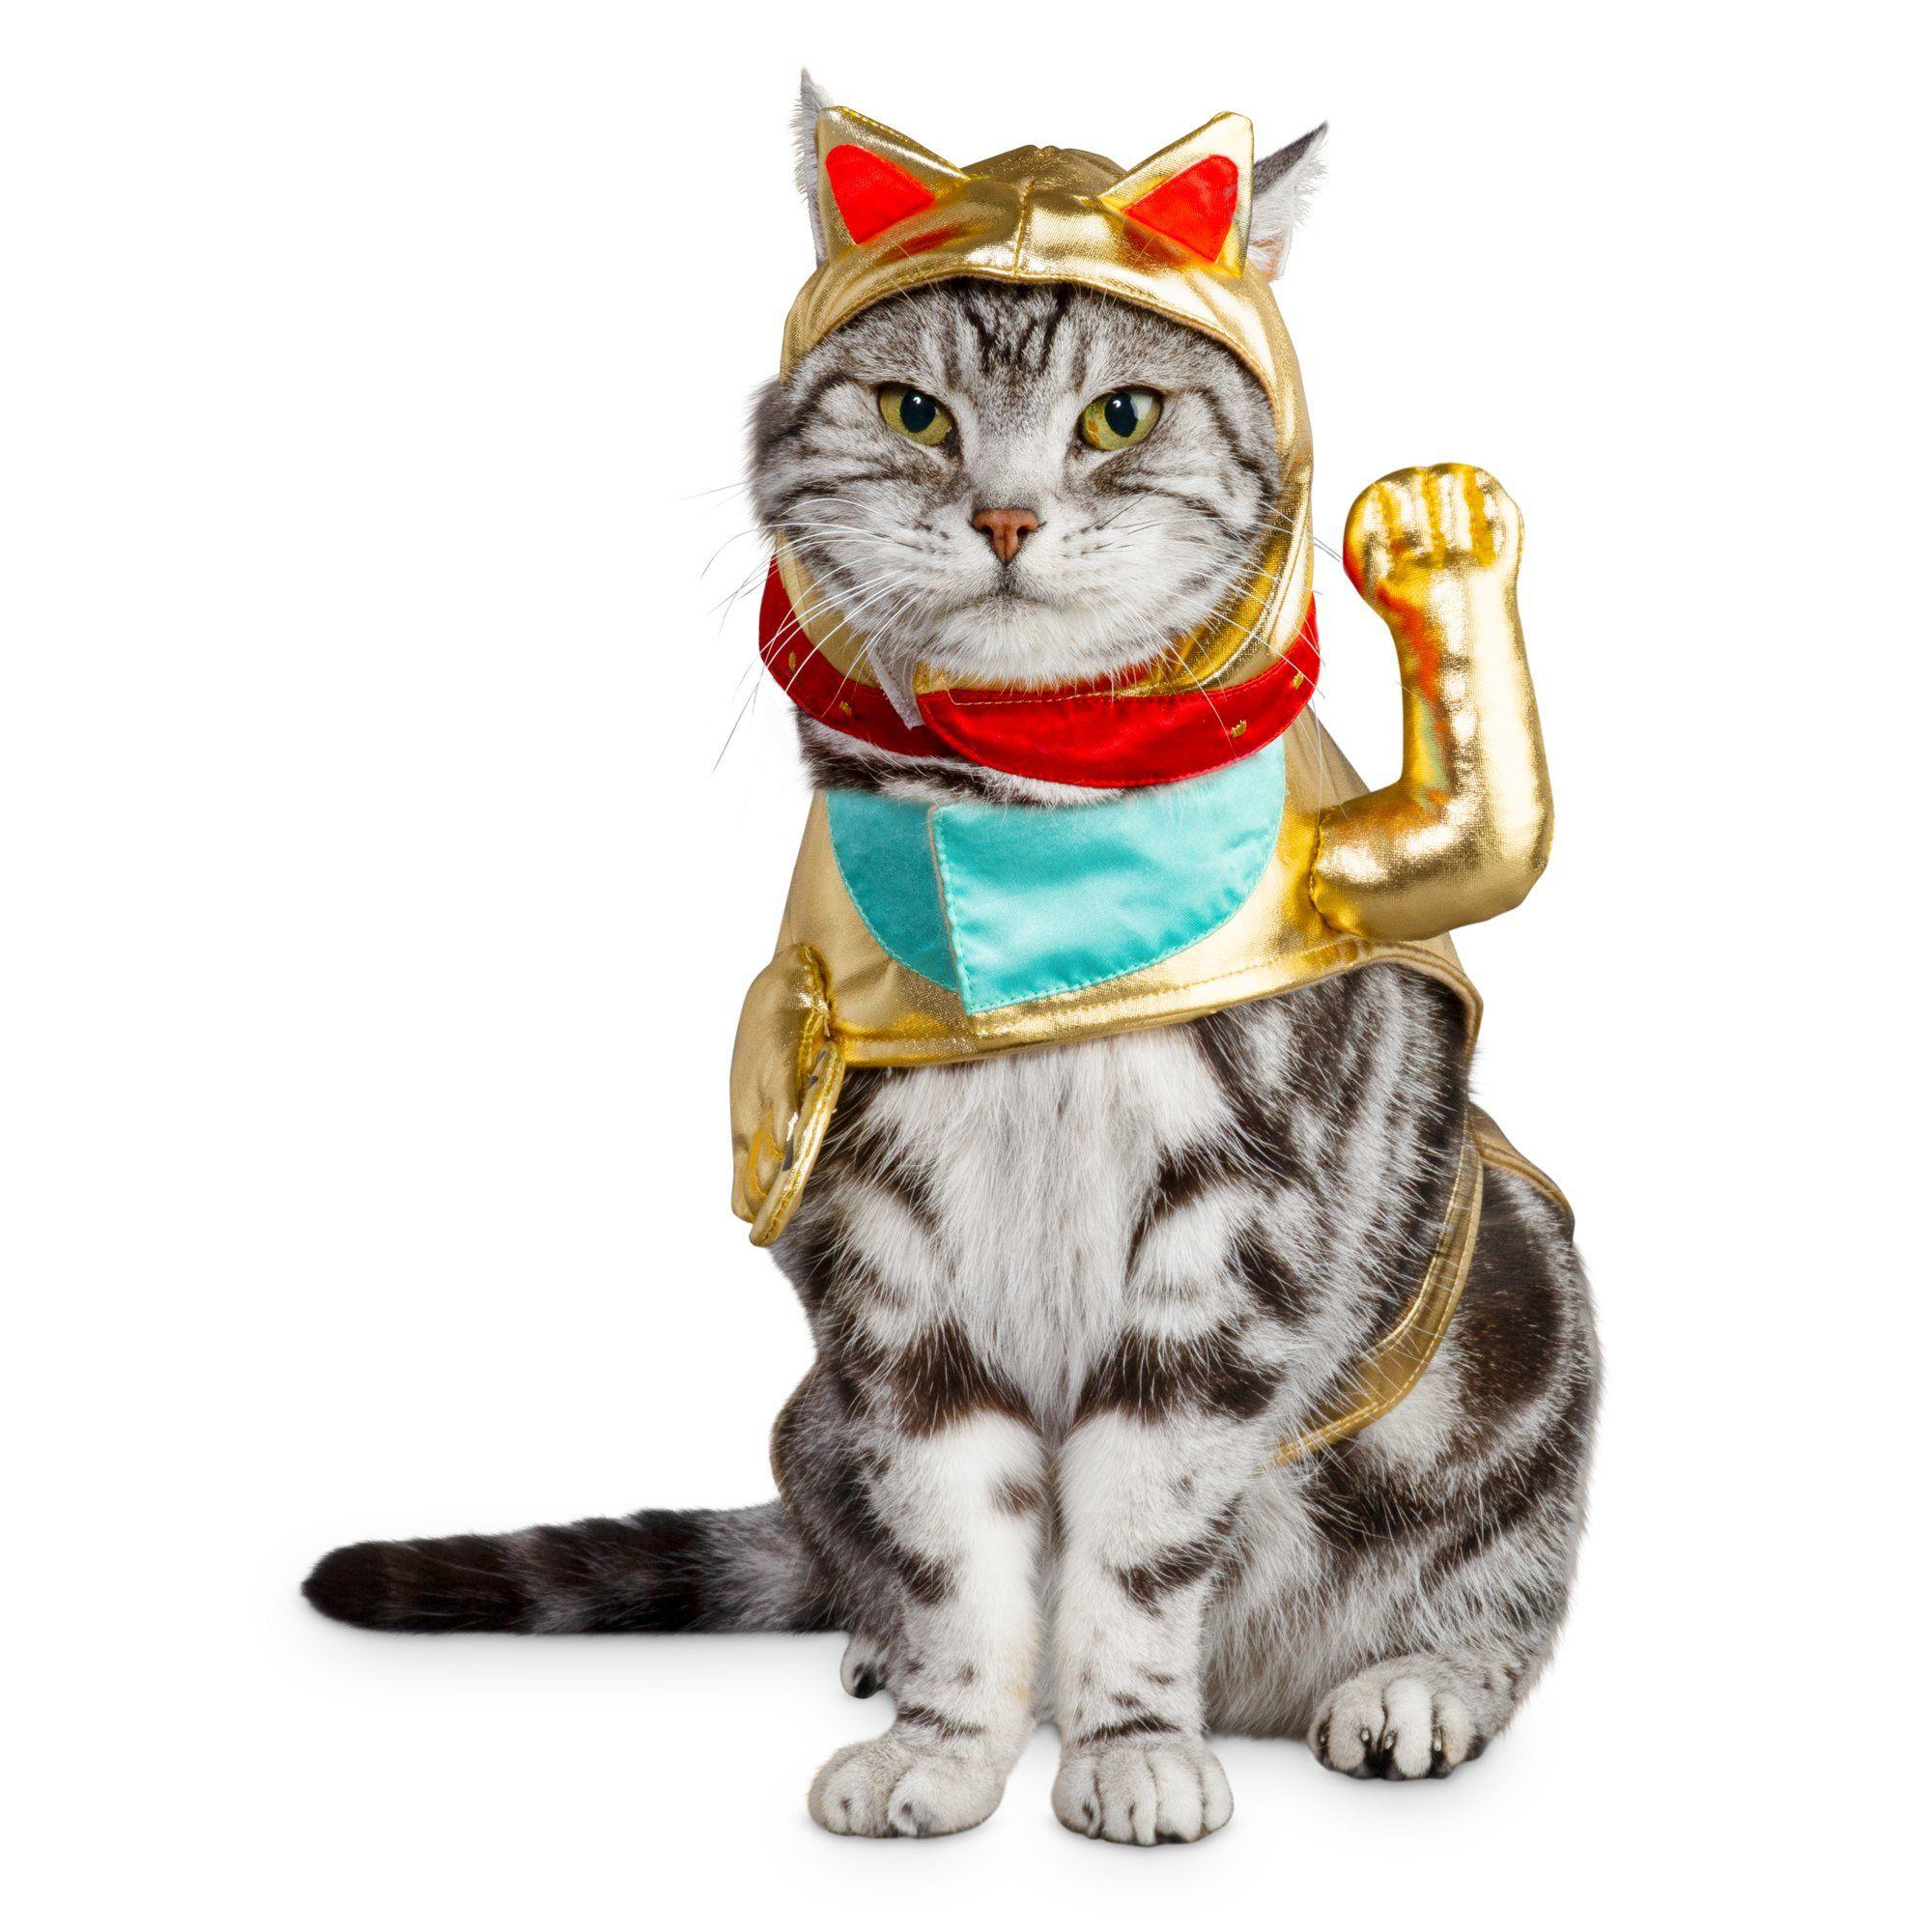 Bootique Lucky Cat Costume Petco Cat Costumes Cat Halloween Costume Halloween Cat